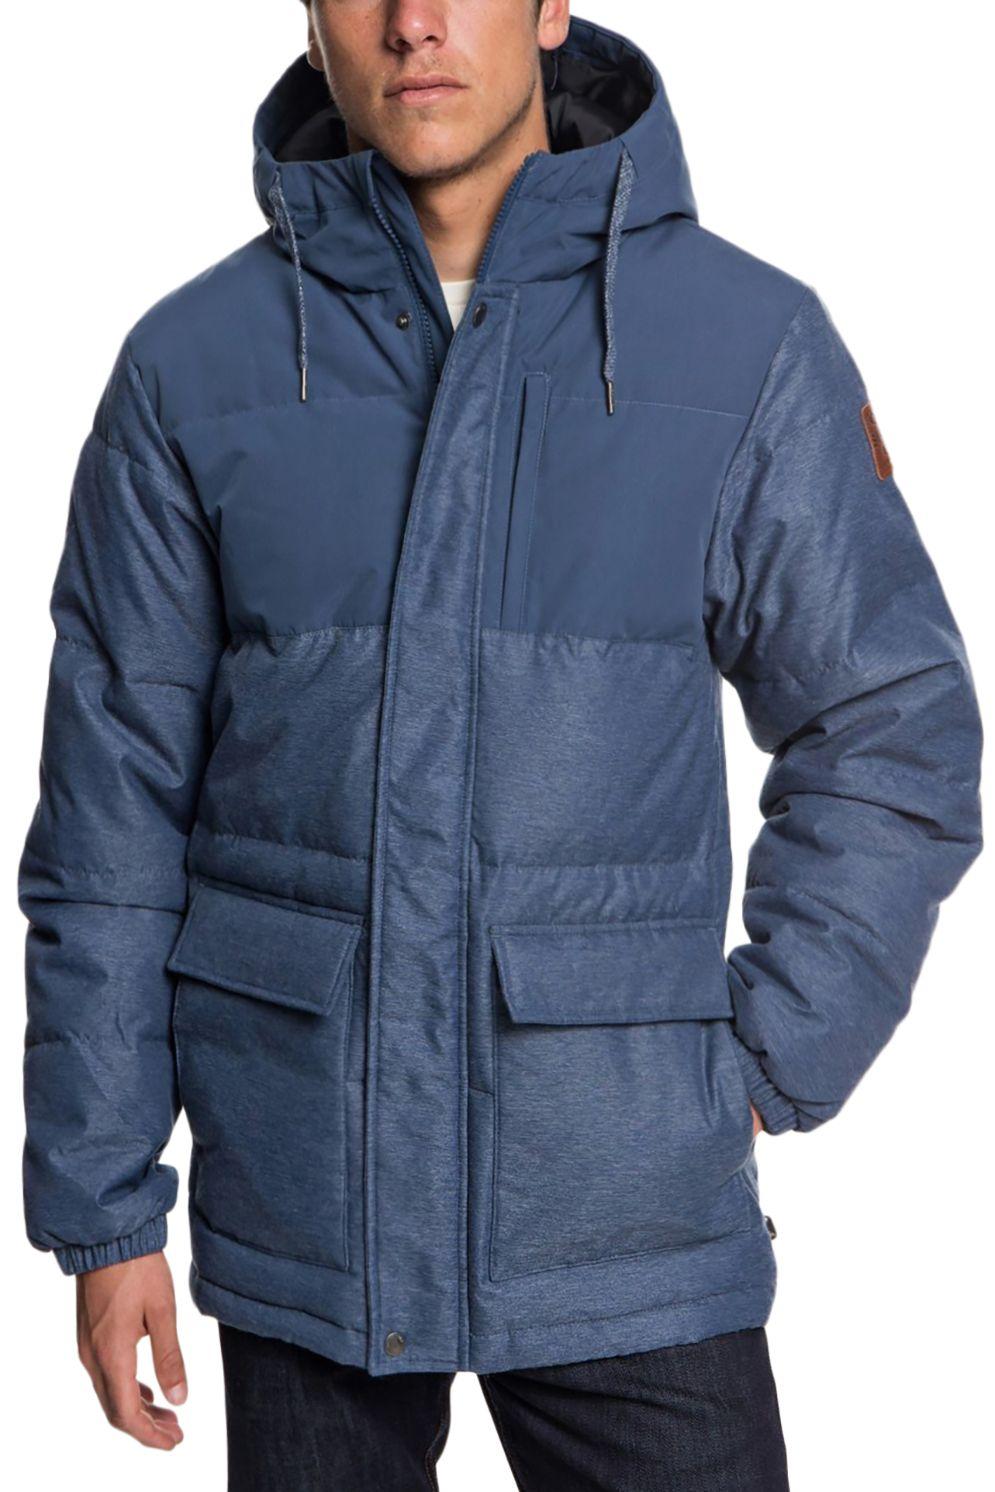 Quiksilver Jacket FULLFINE M JCKT Dark Denim